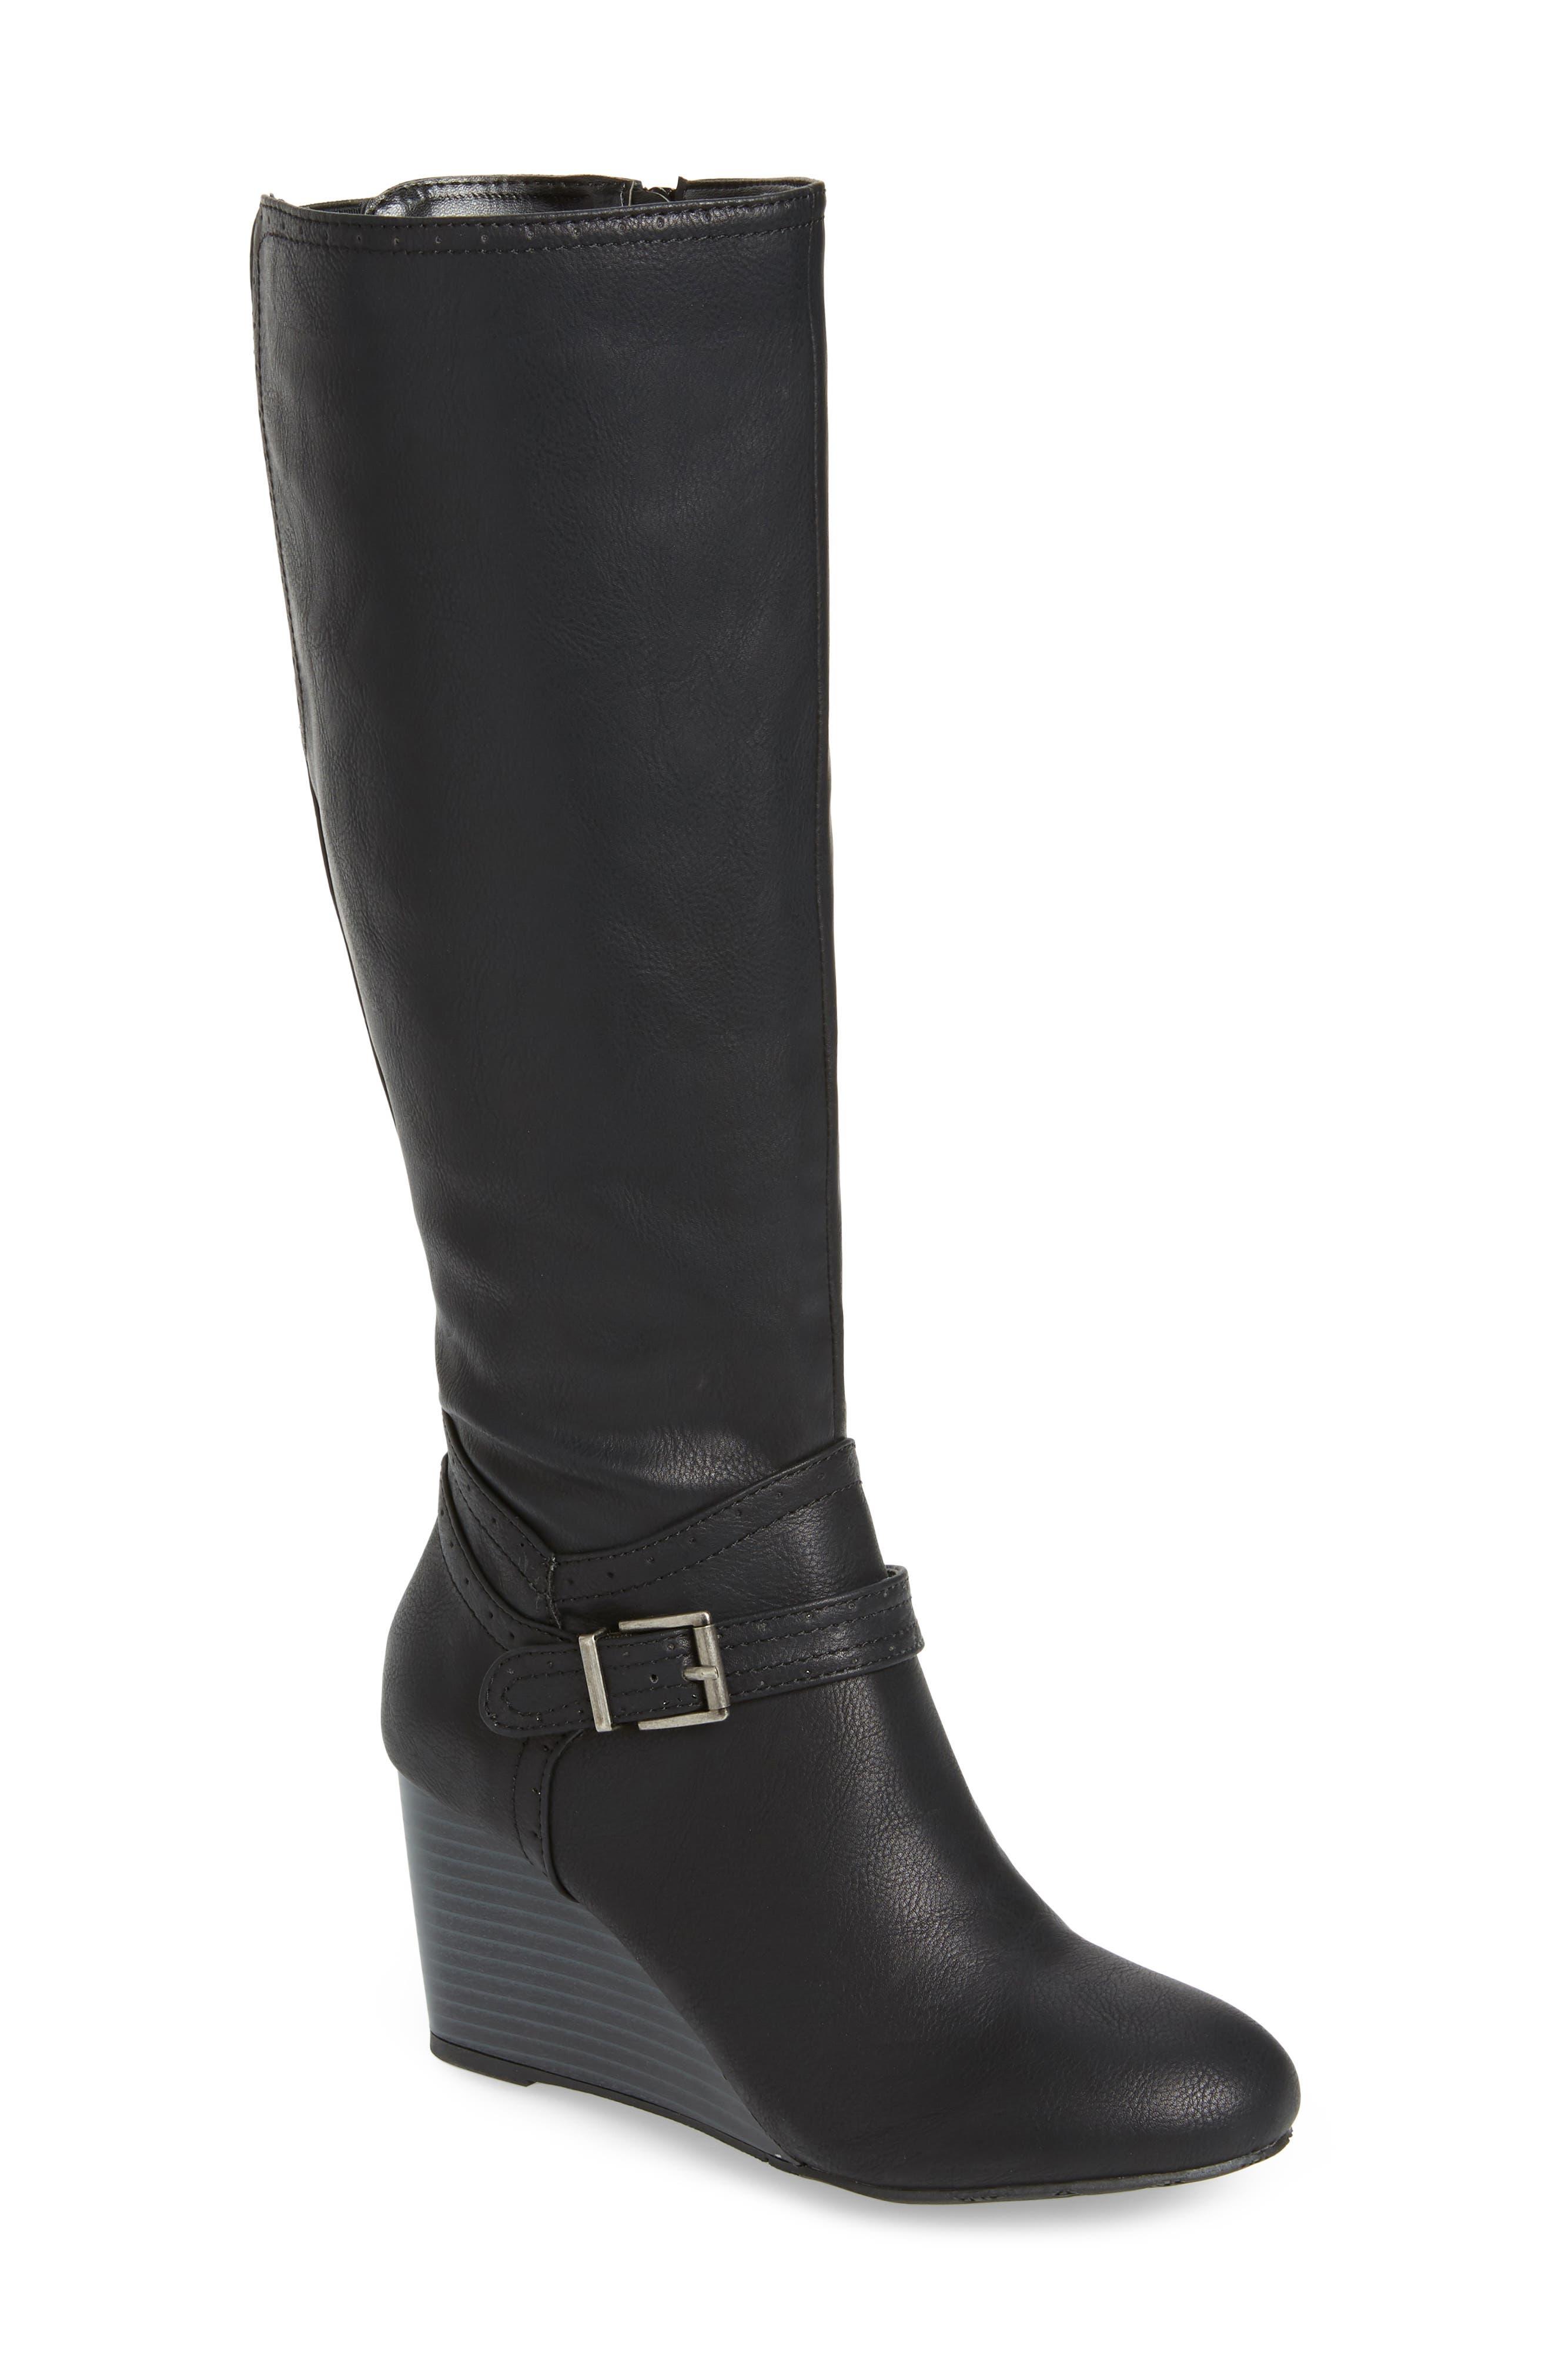 Claretta Knee High Wedge Boot,                             Main thumbnail 1, color,                             BLACK VEGAN LEATHER